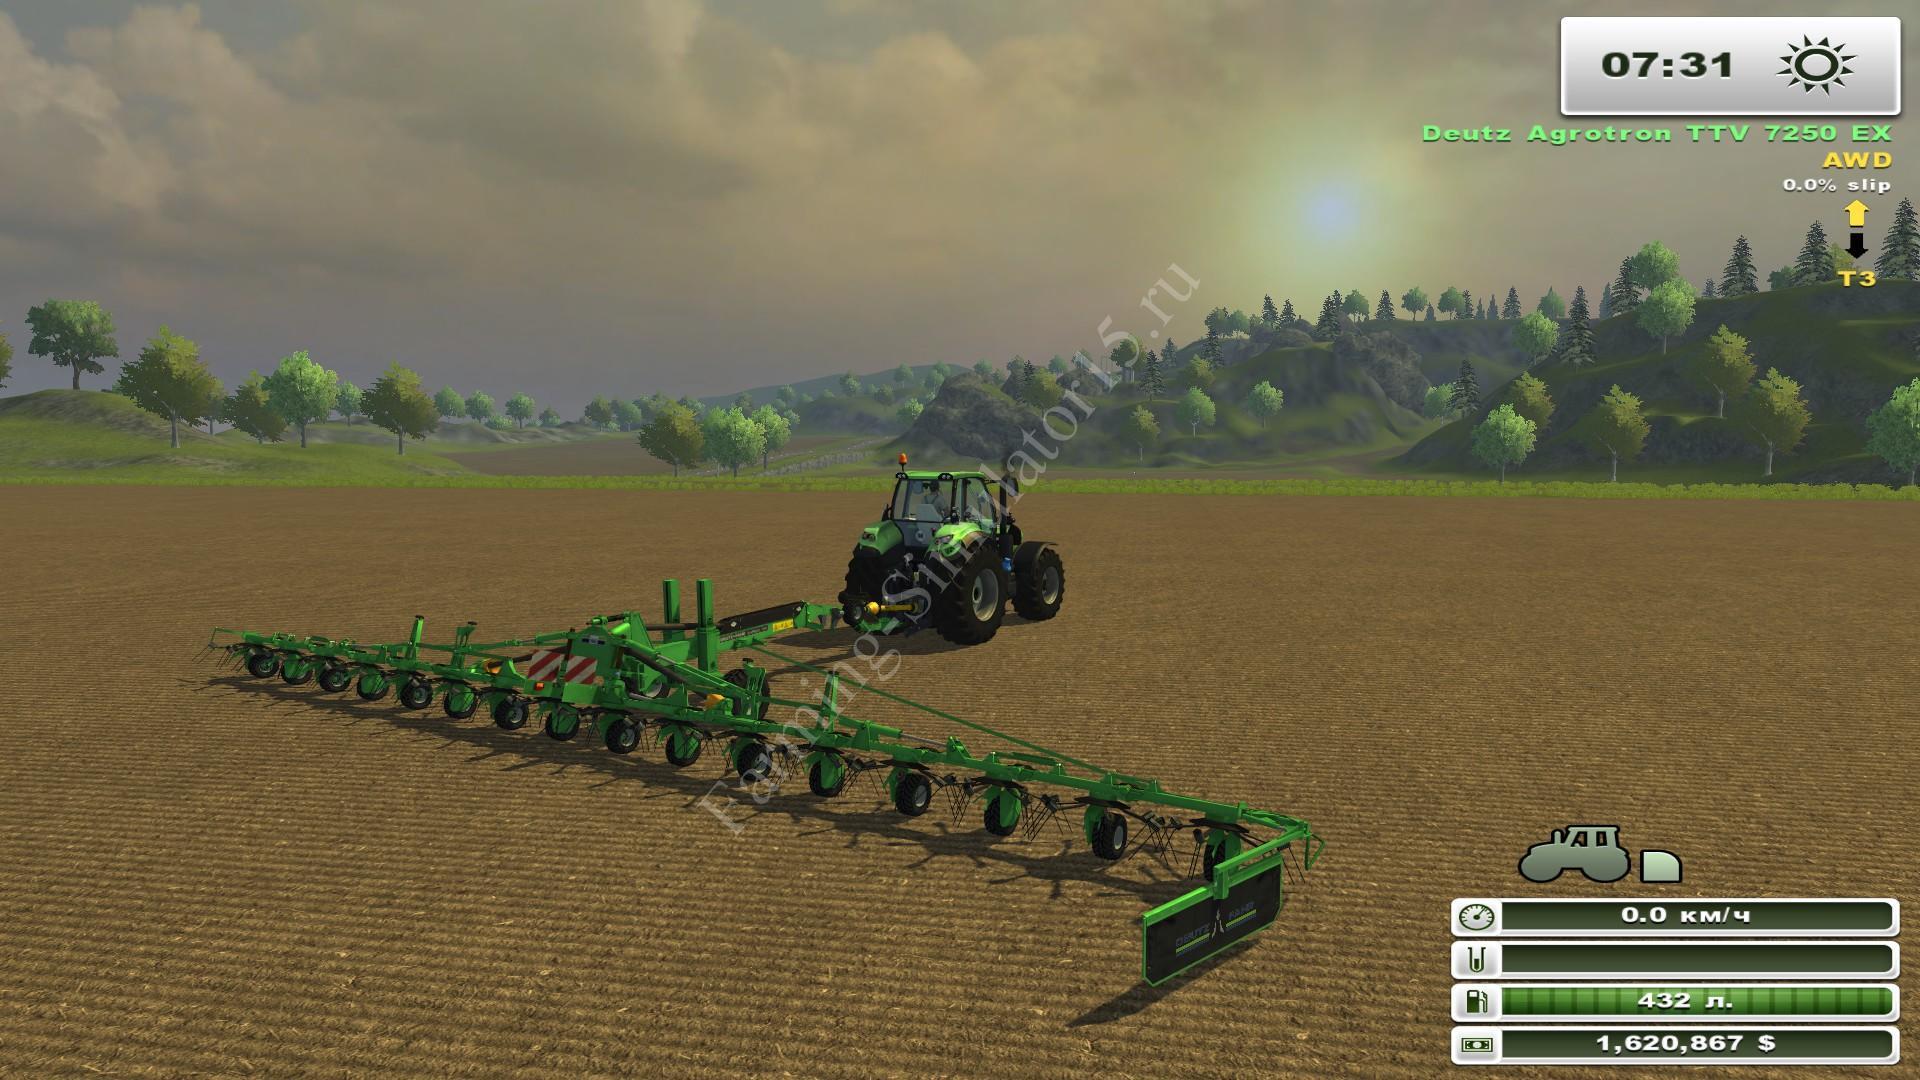 Мод ворошилки Driving CondiMaster 17041 v 1.0 Farming Simulator 2013, Farming Simulator 13